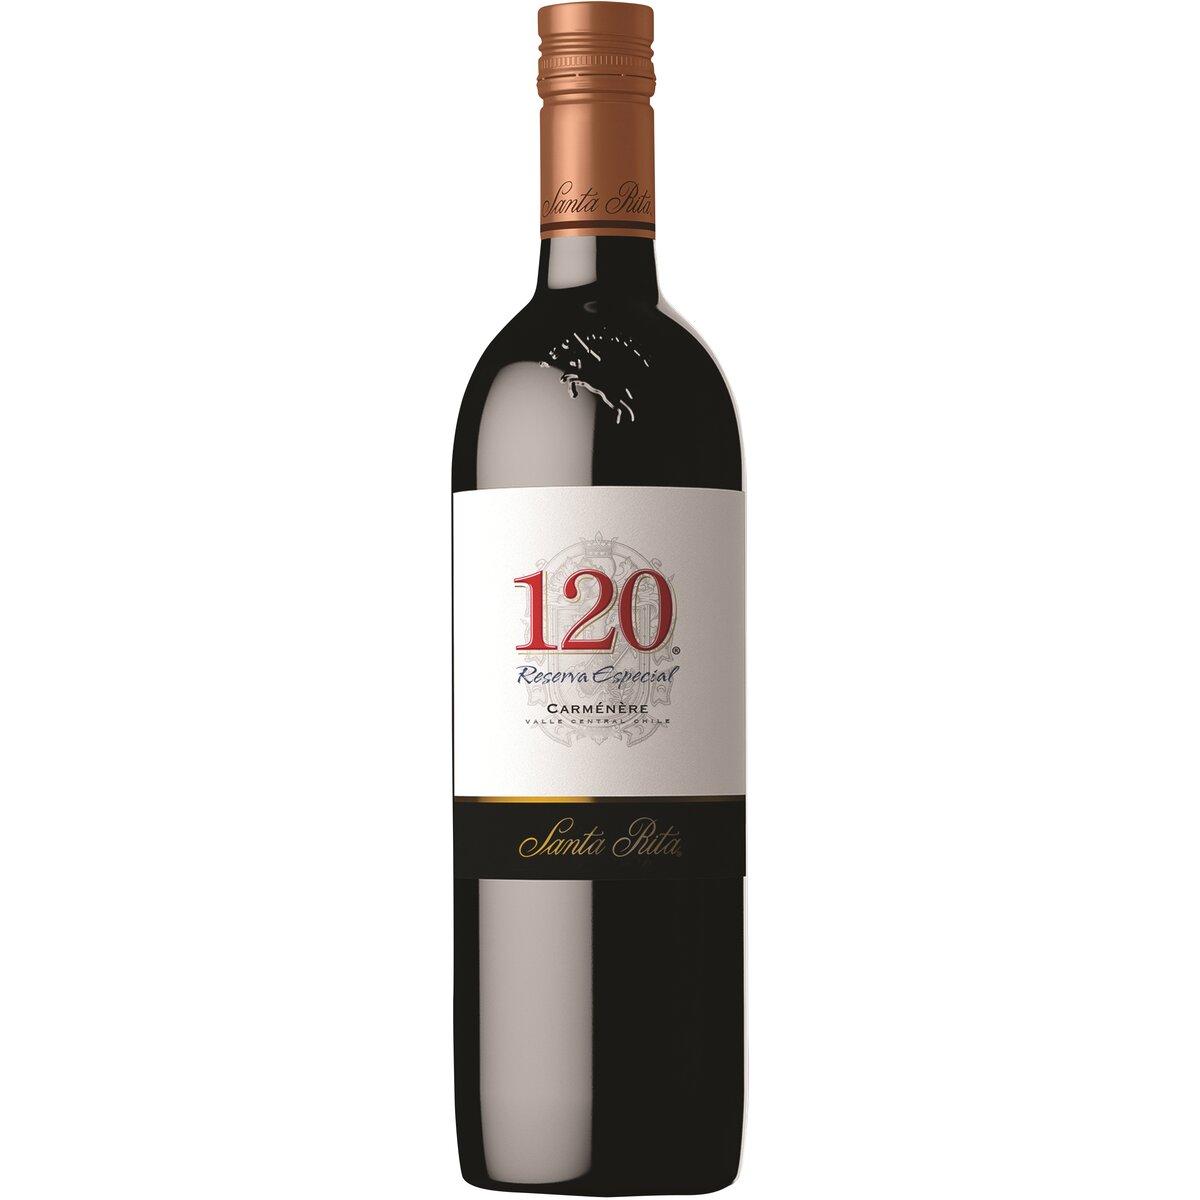 Image of 120 Carmen